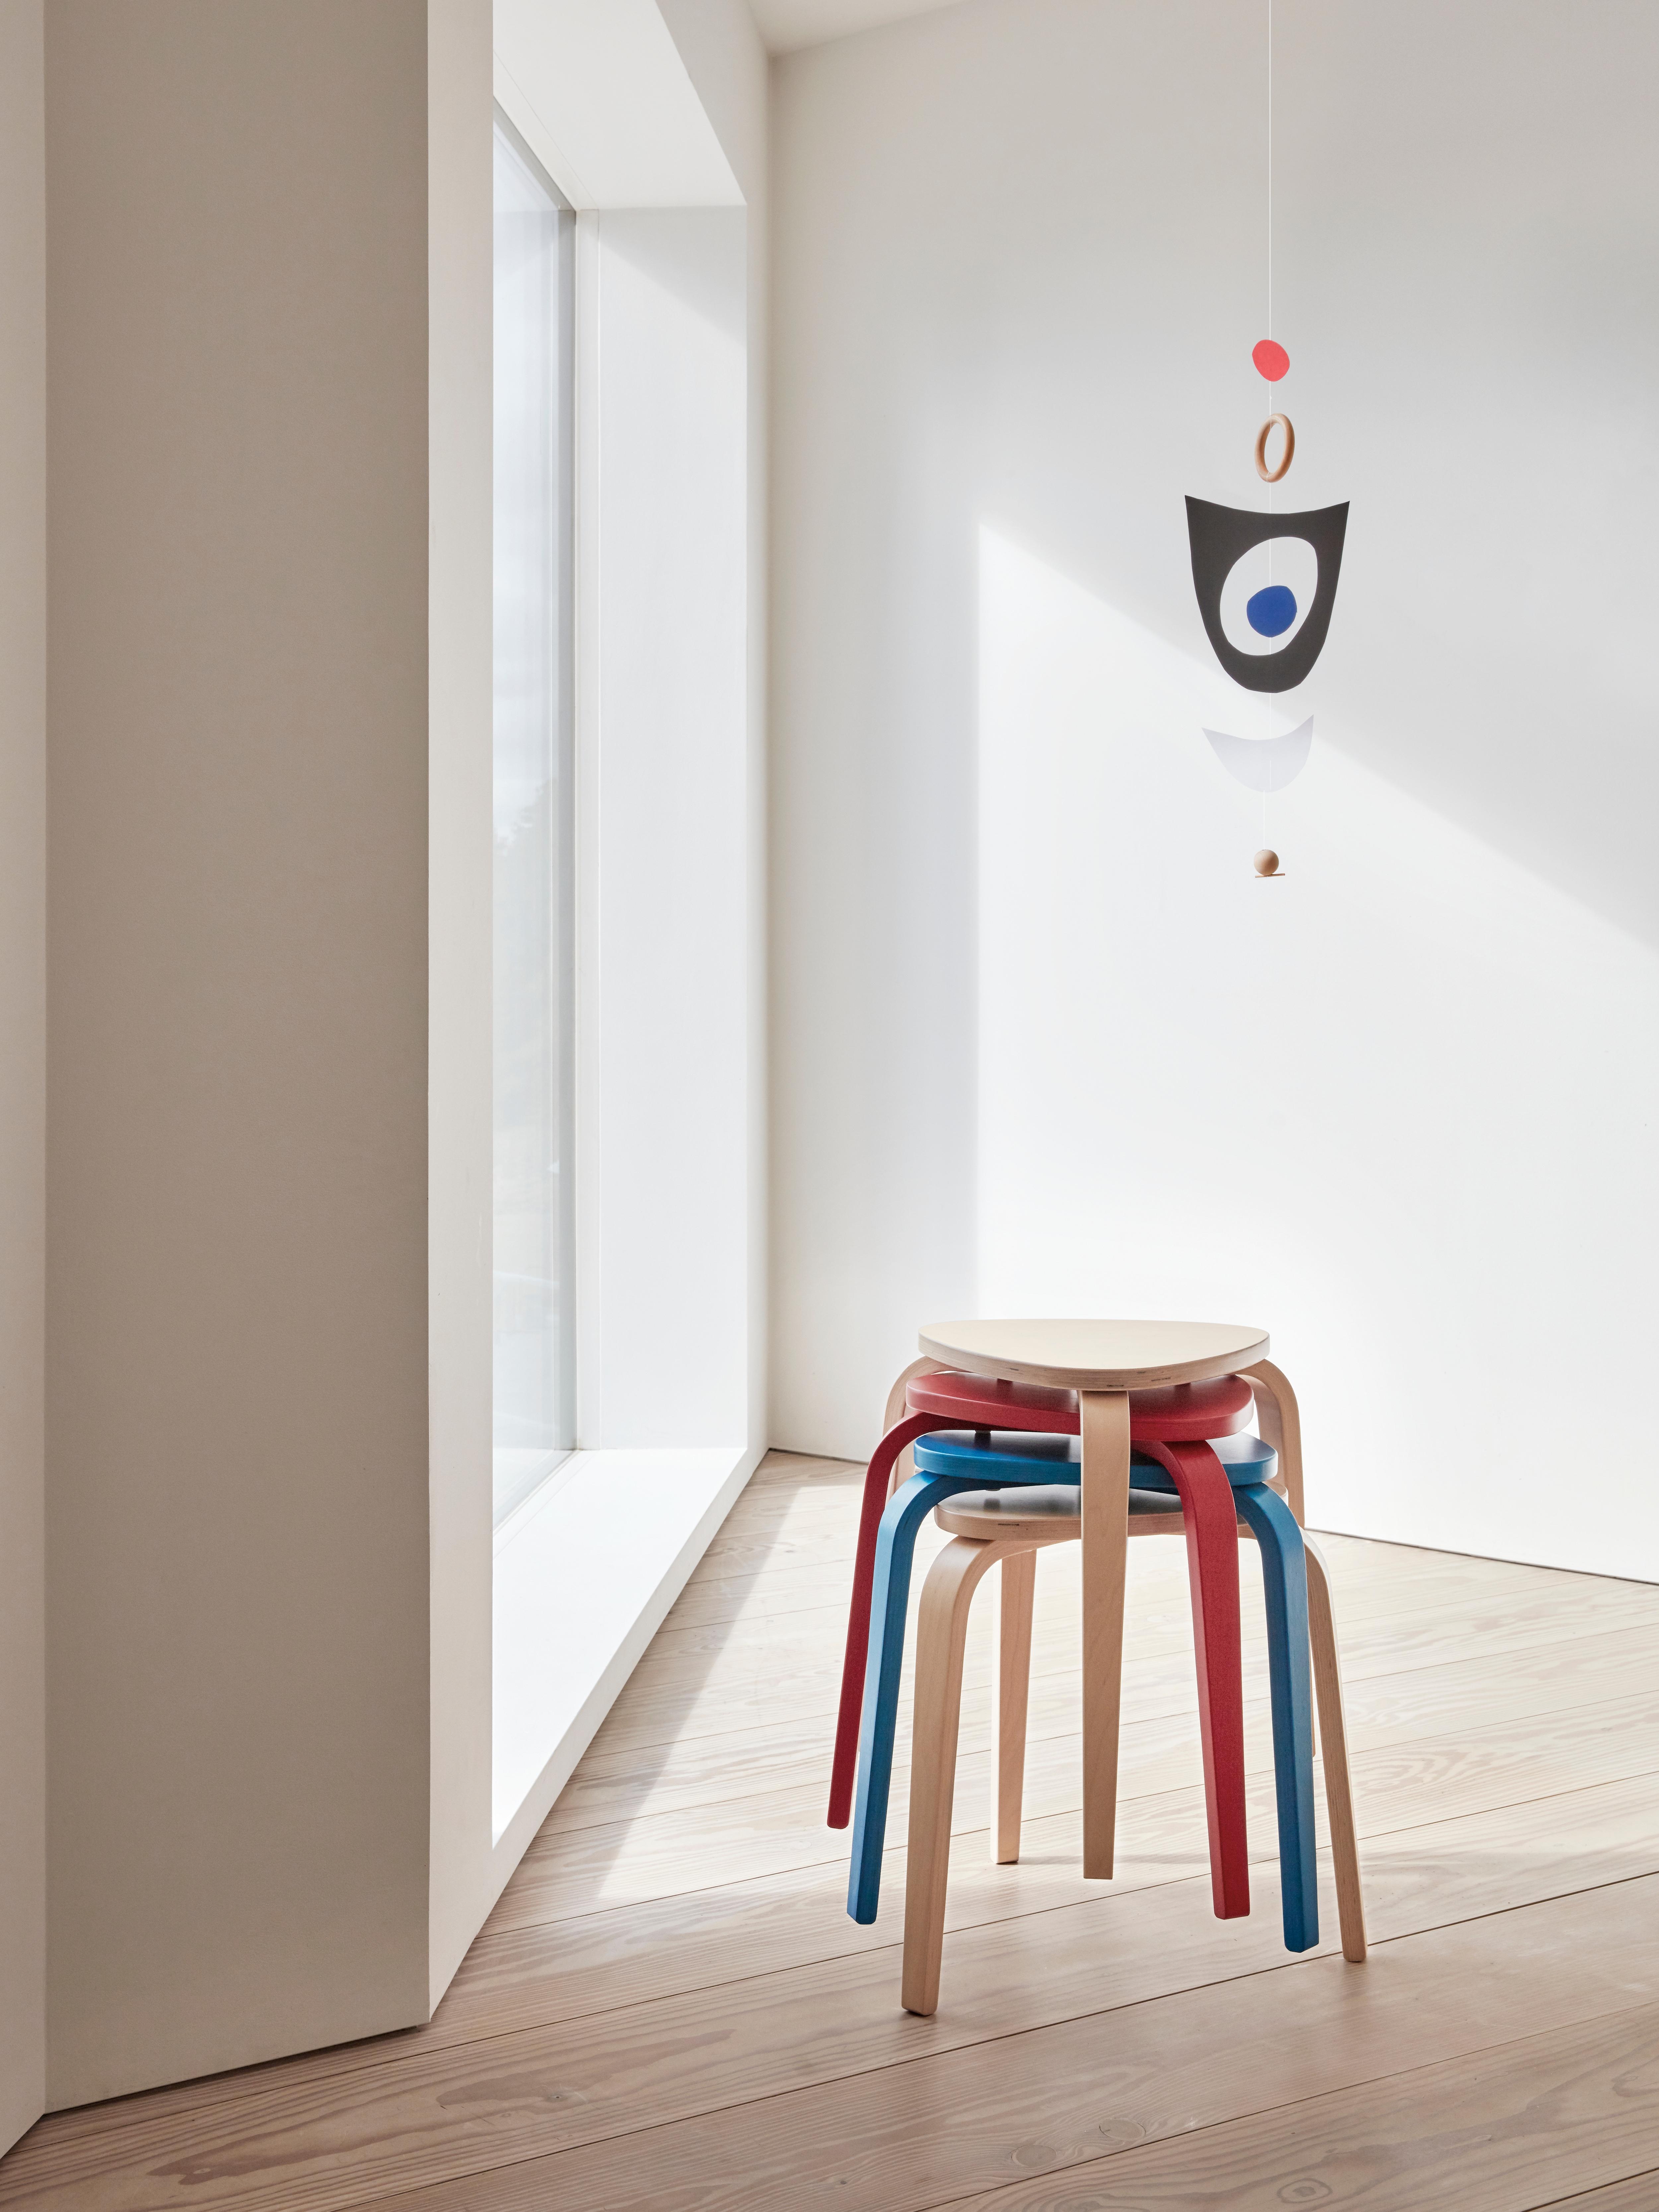 Četiri naslagana KYRRE drvena stolca od drva breze, crvene i plave boje u prostoriji s mobilom.